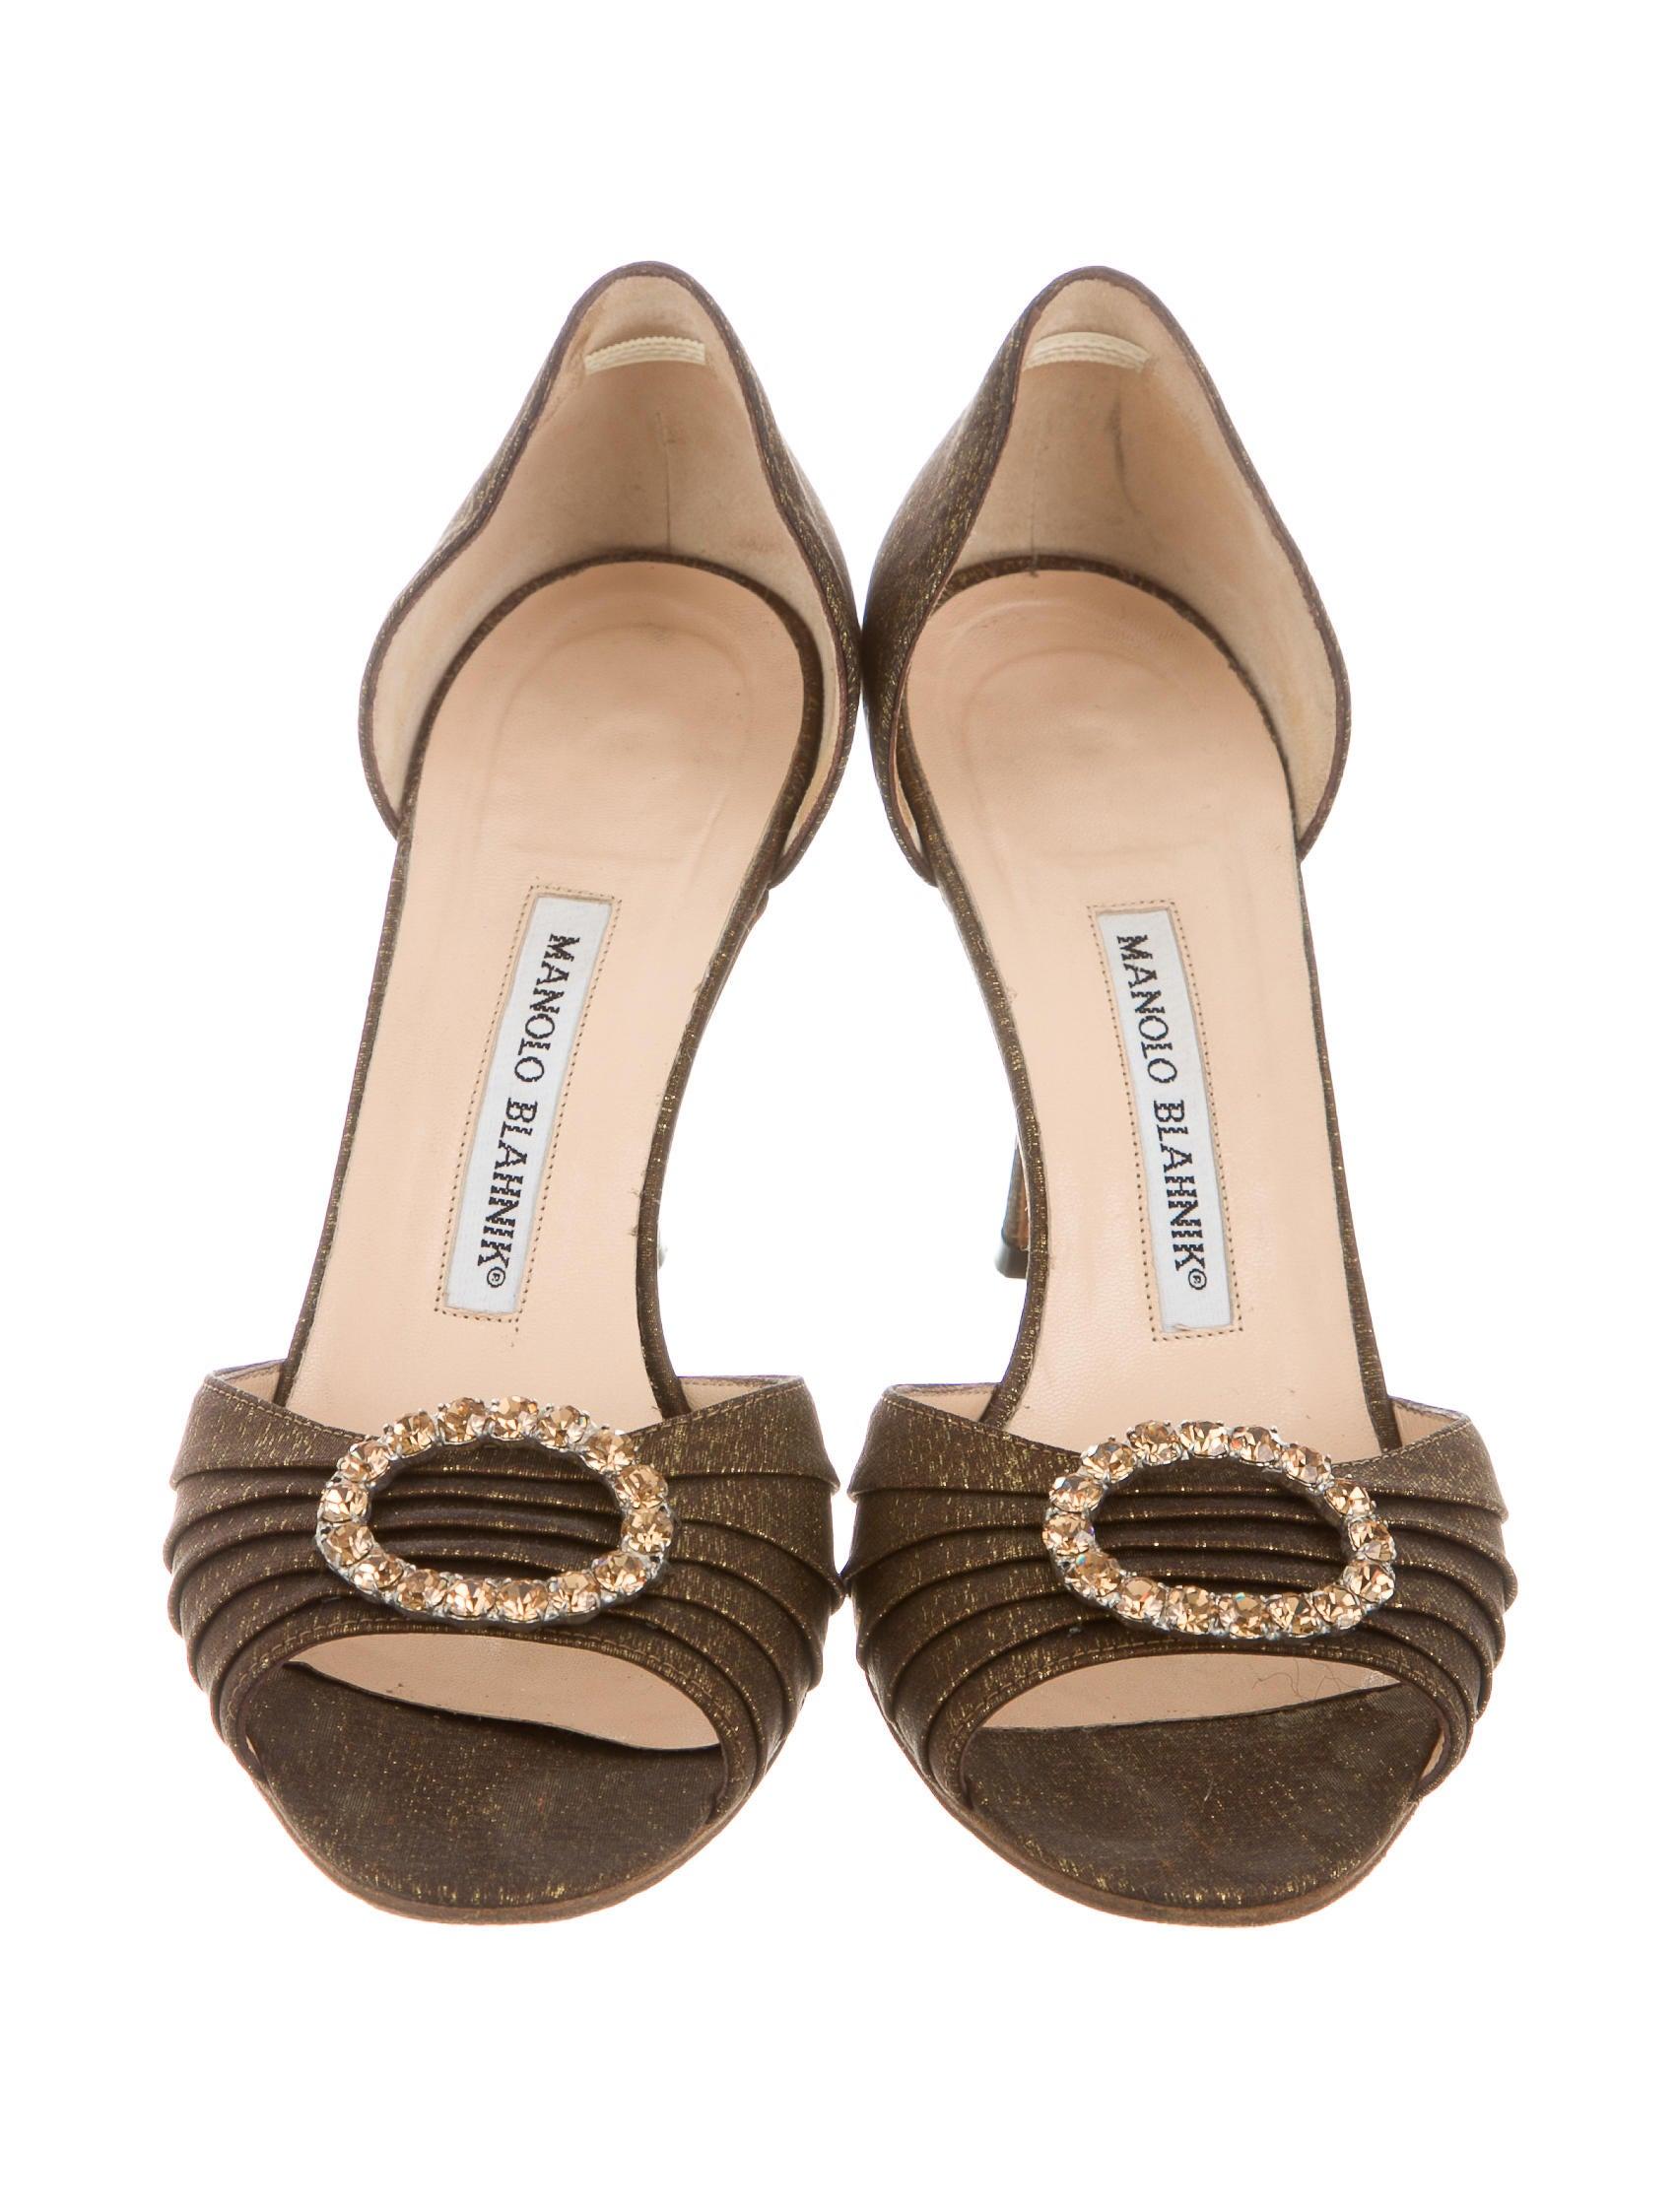 Manolo blahnik metallic peep toe pumps shoes moo51129 for Shoes by manolo blahnik